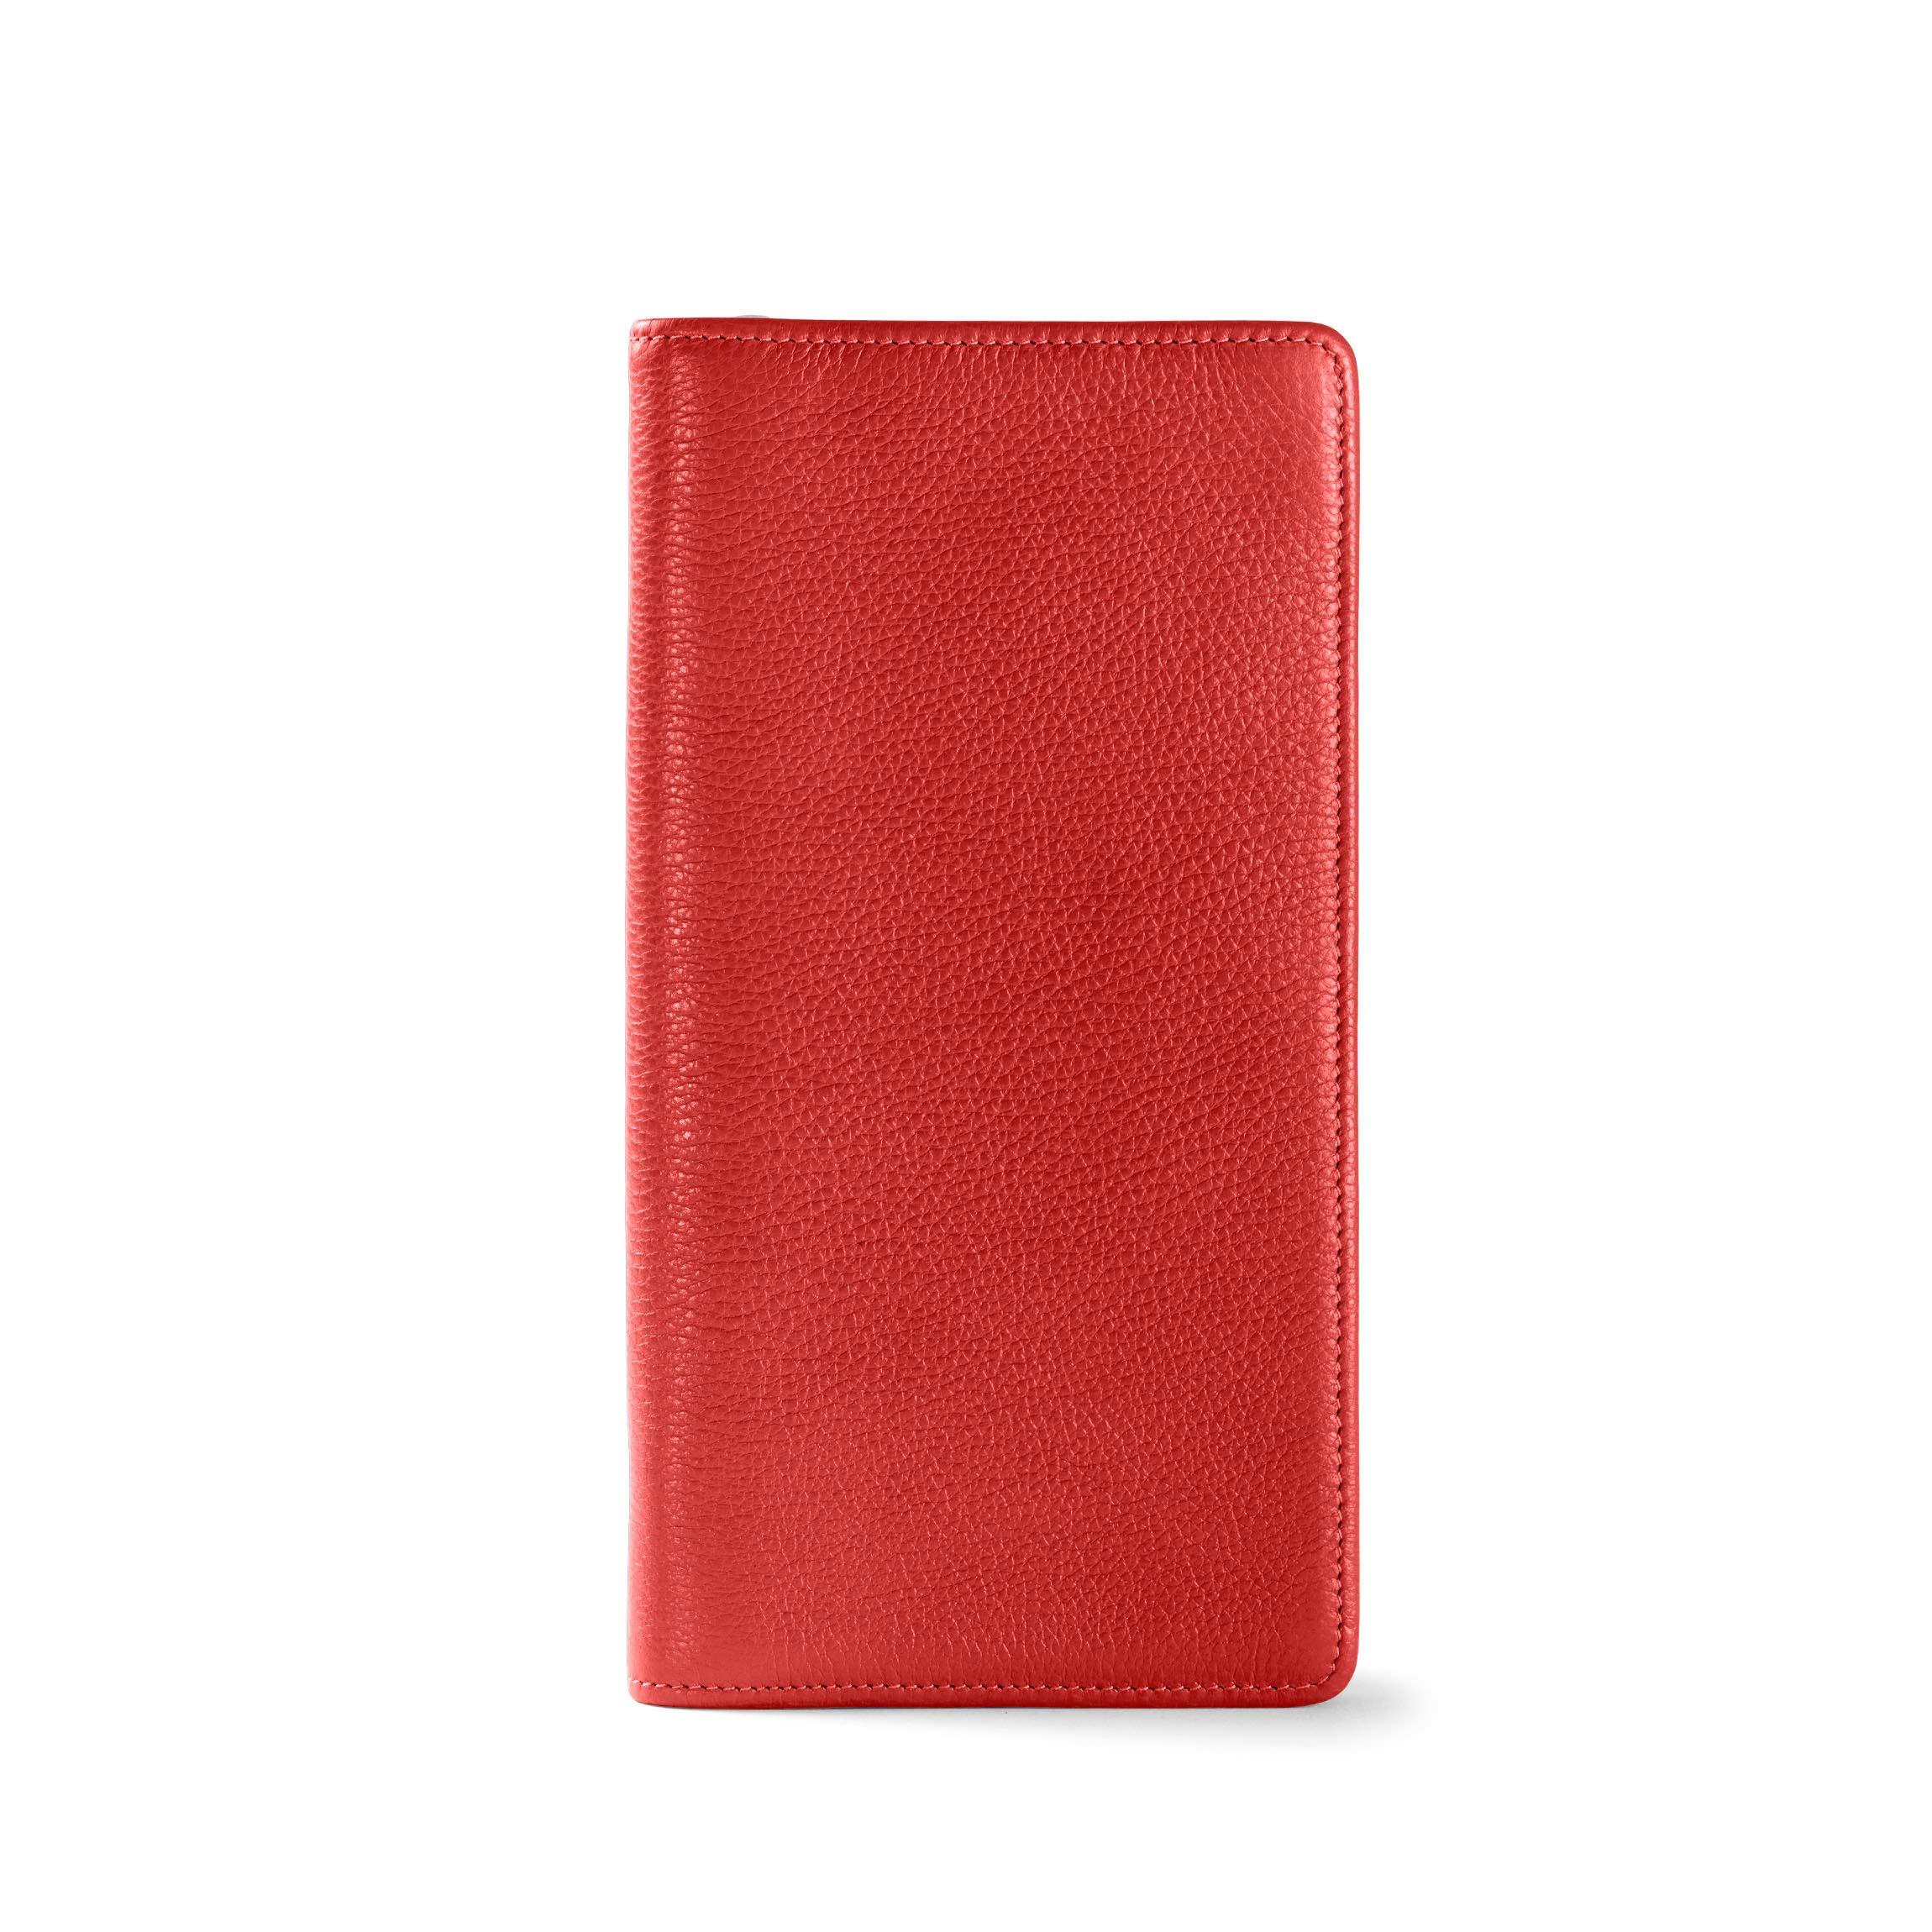 Leatherology RFID Scarlet Zip Around Travel Wallet by Leatherology